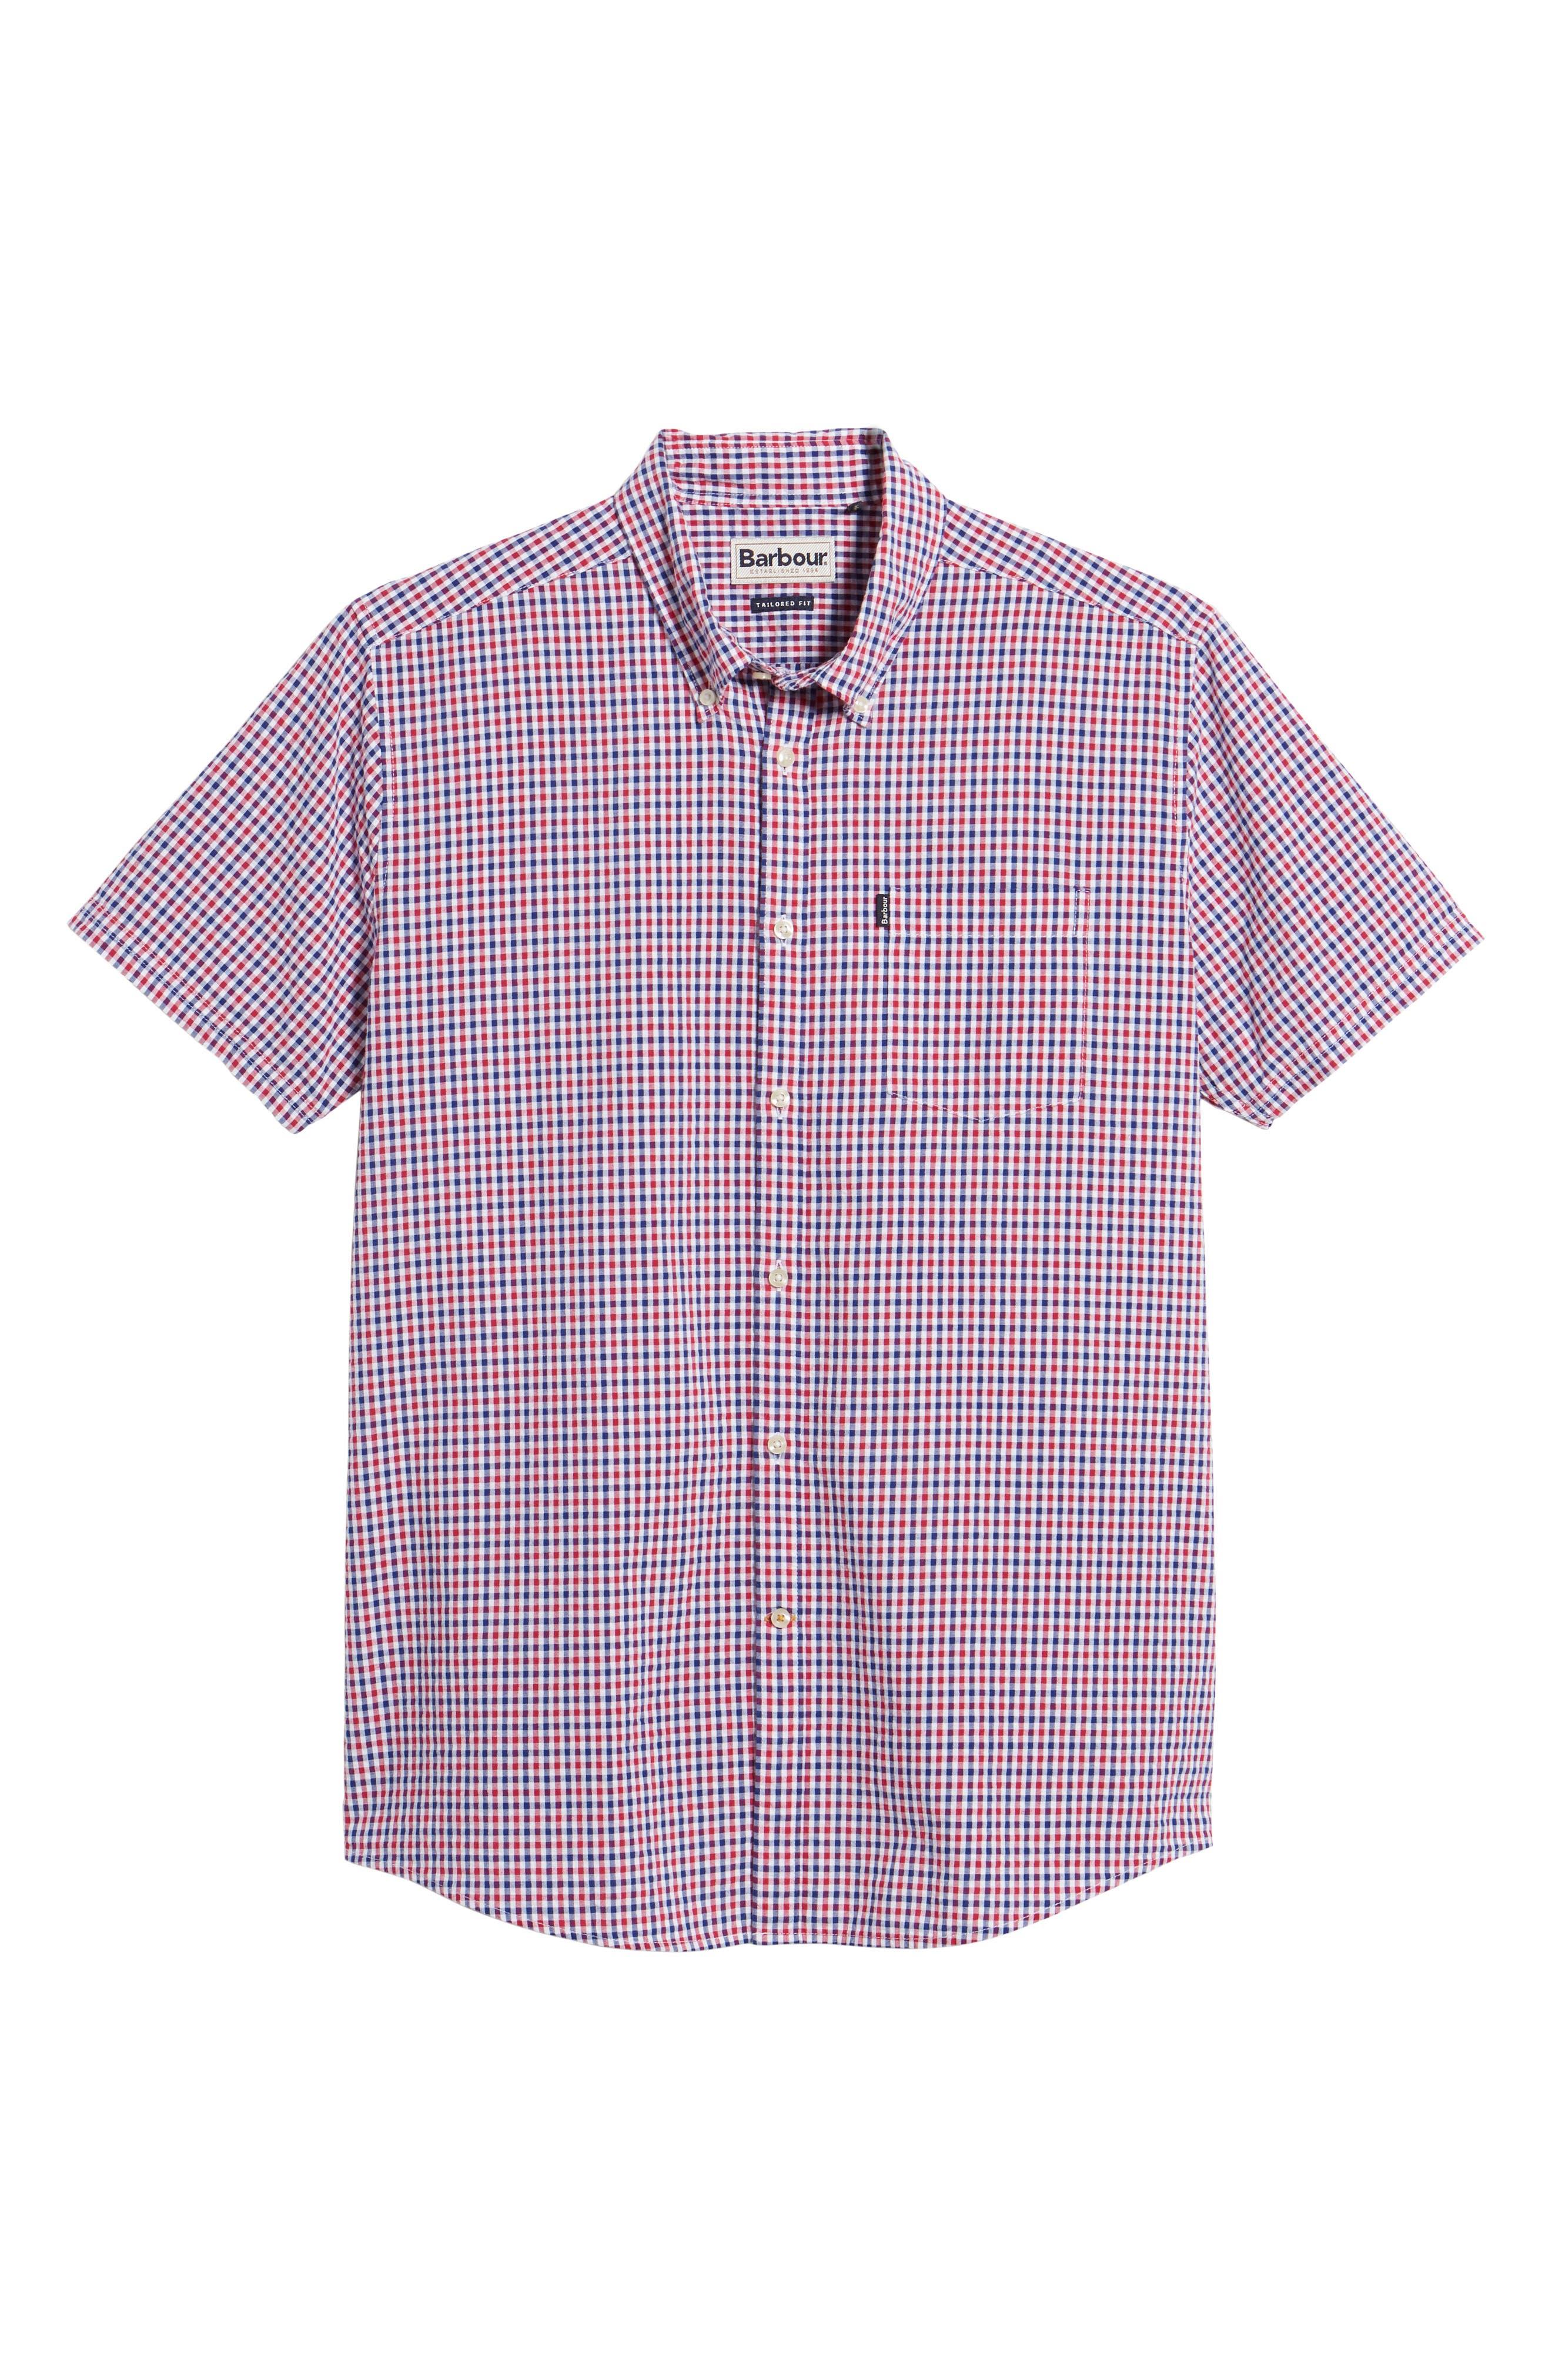 Taylor Regular Fit Check Short Sleeve Sport Shirt,                             Alternate thumbnail 6, color,                             Navy